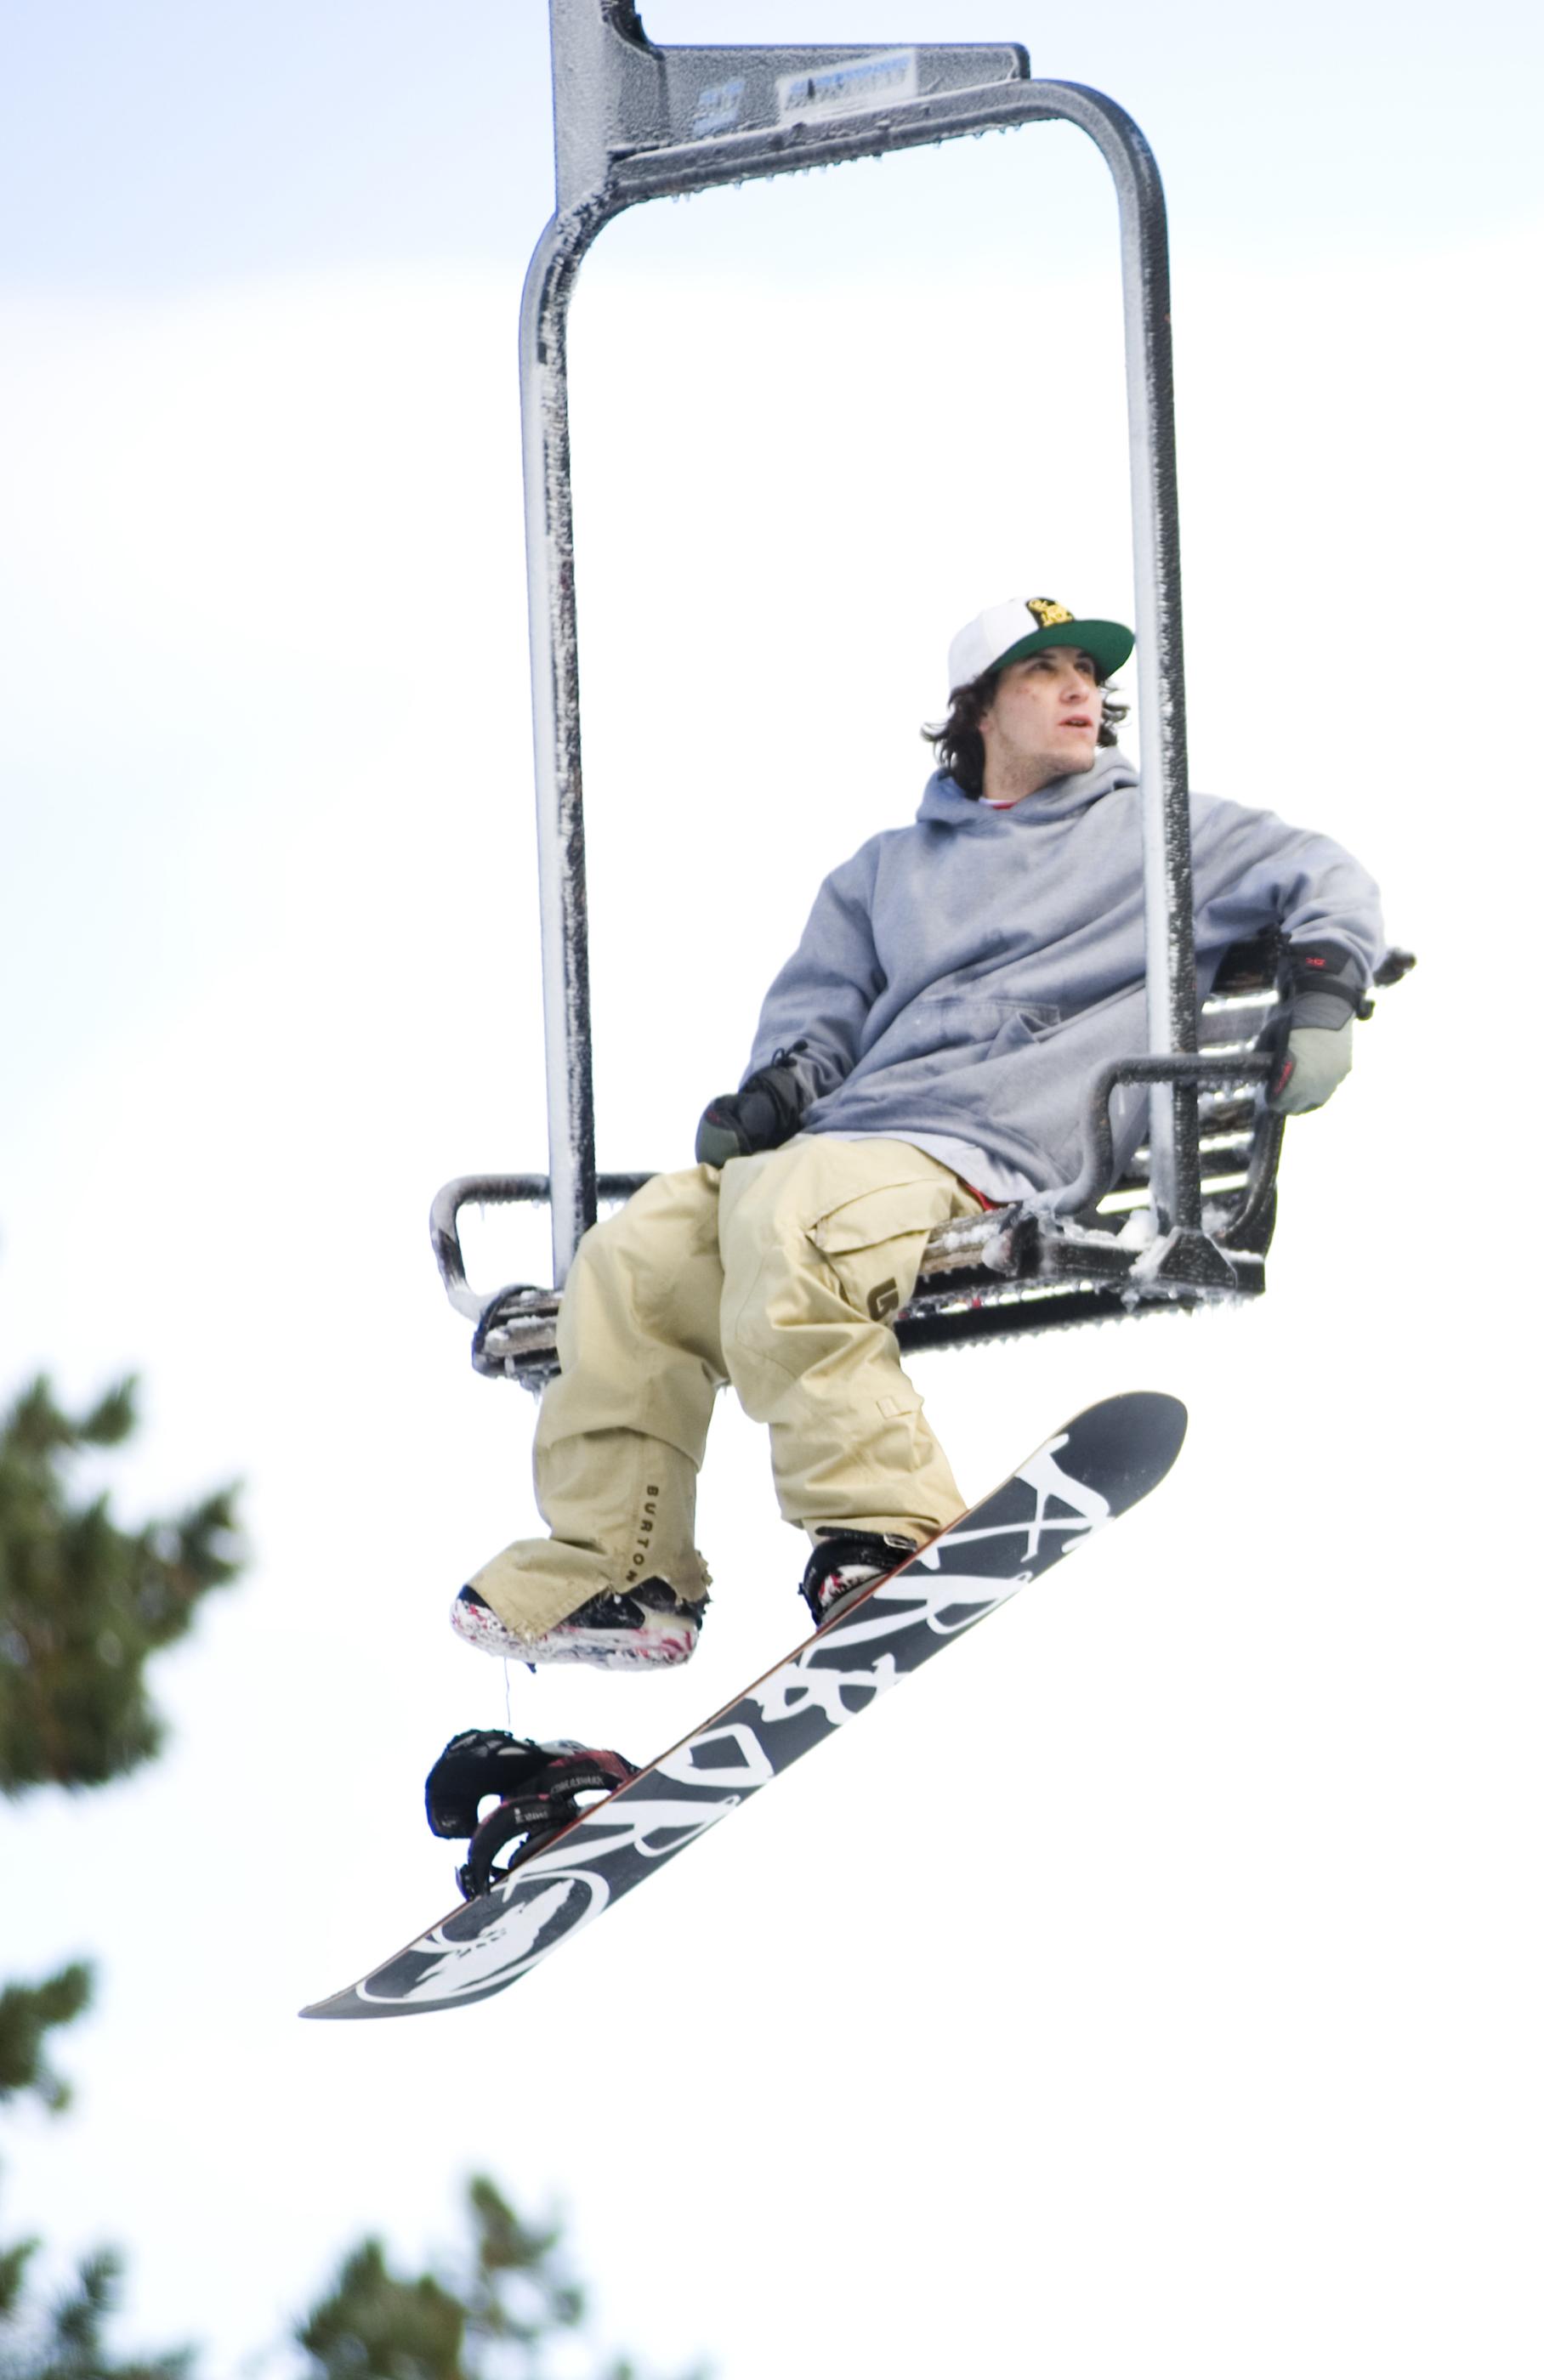 skiresortopen007